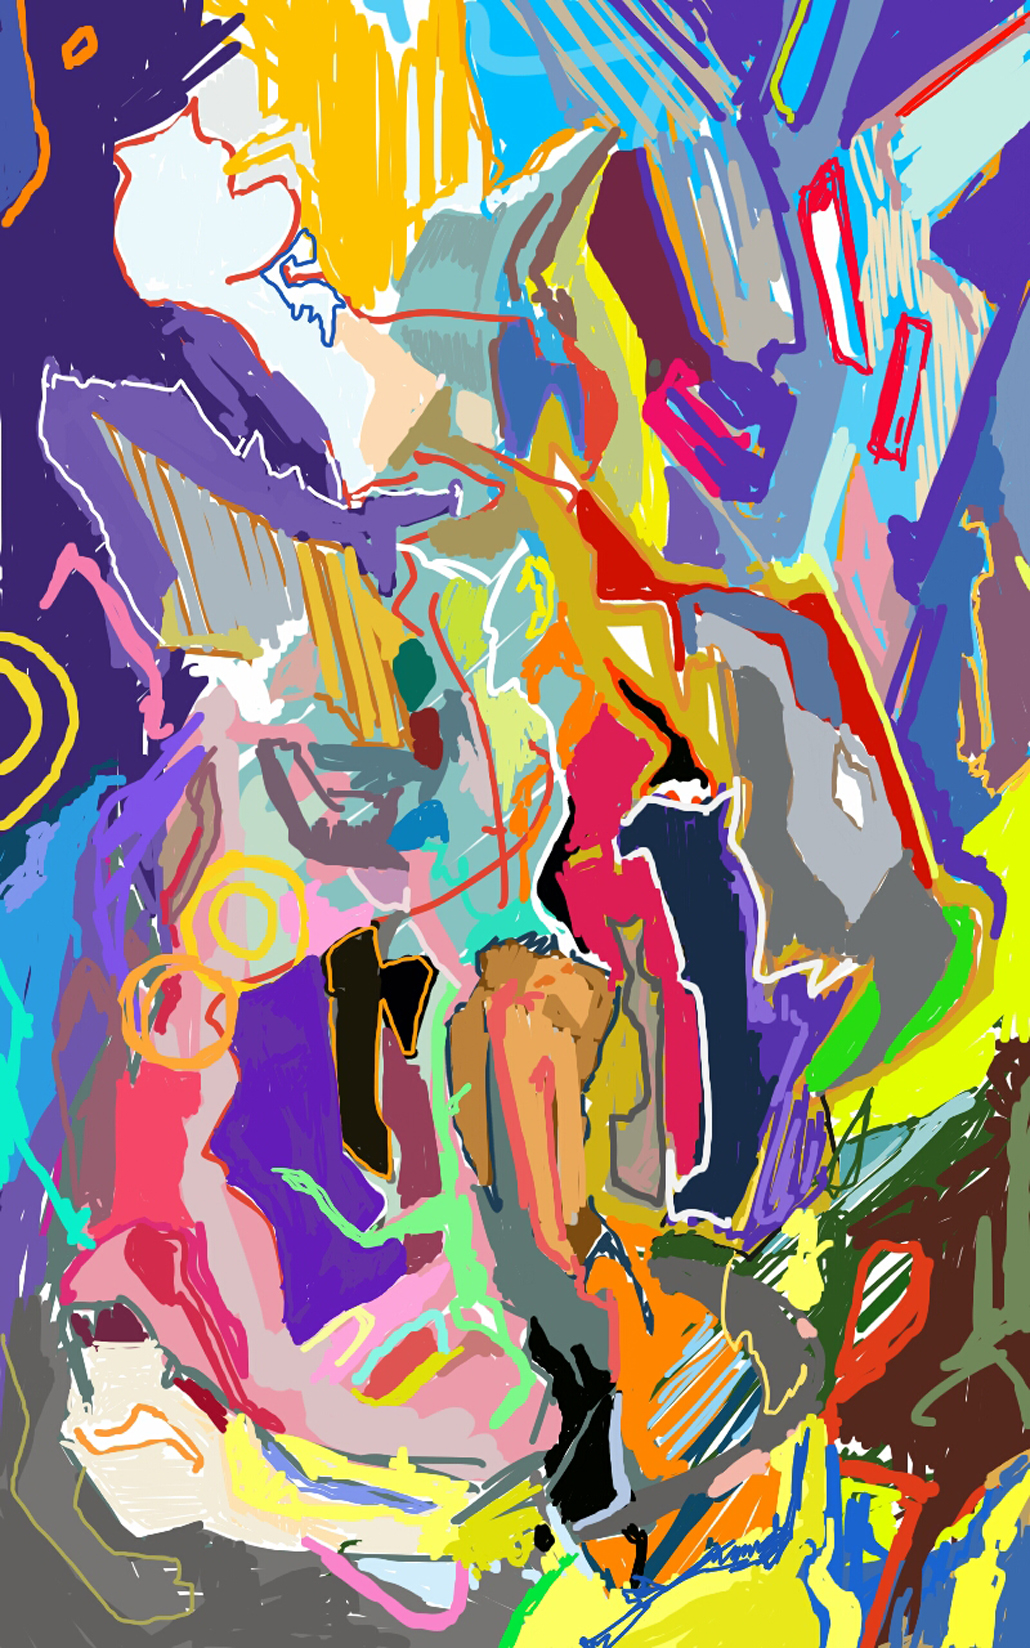 partycrasher_web_artbo.jpg